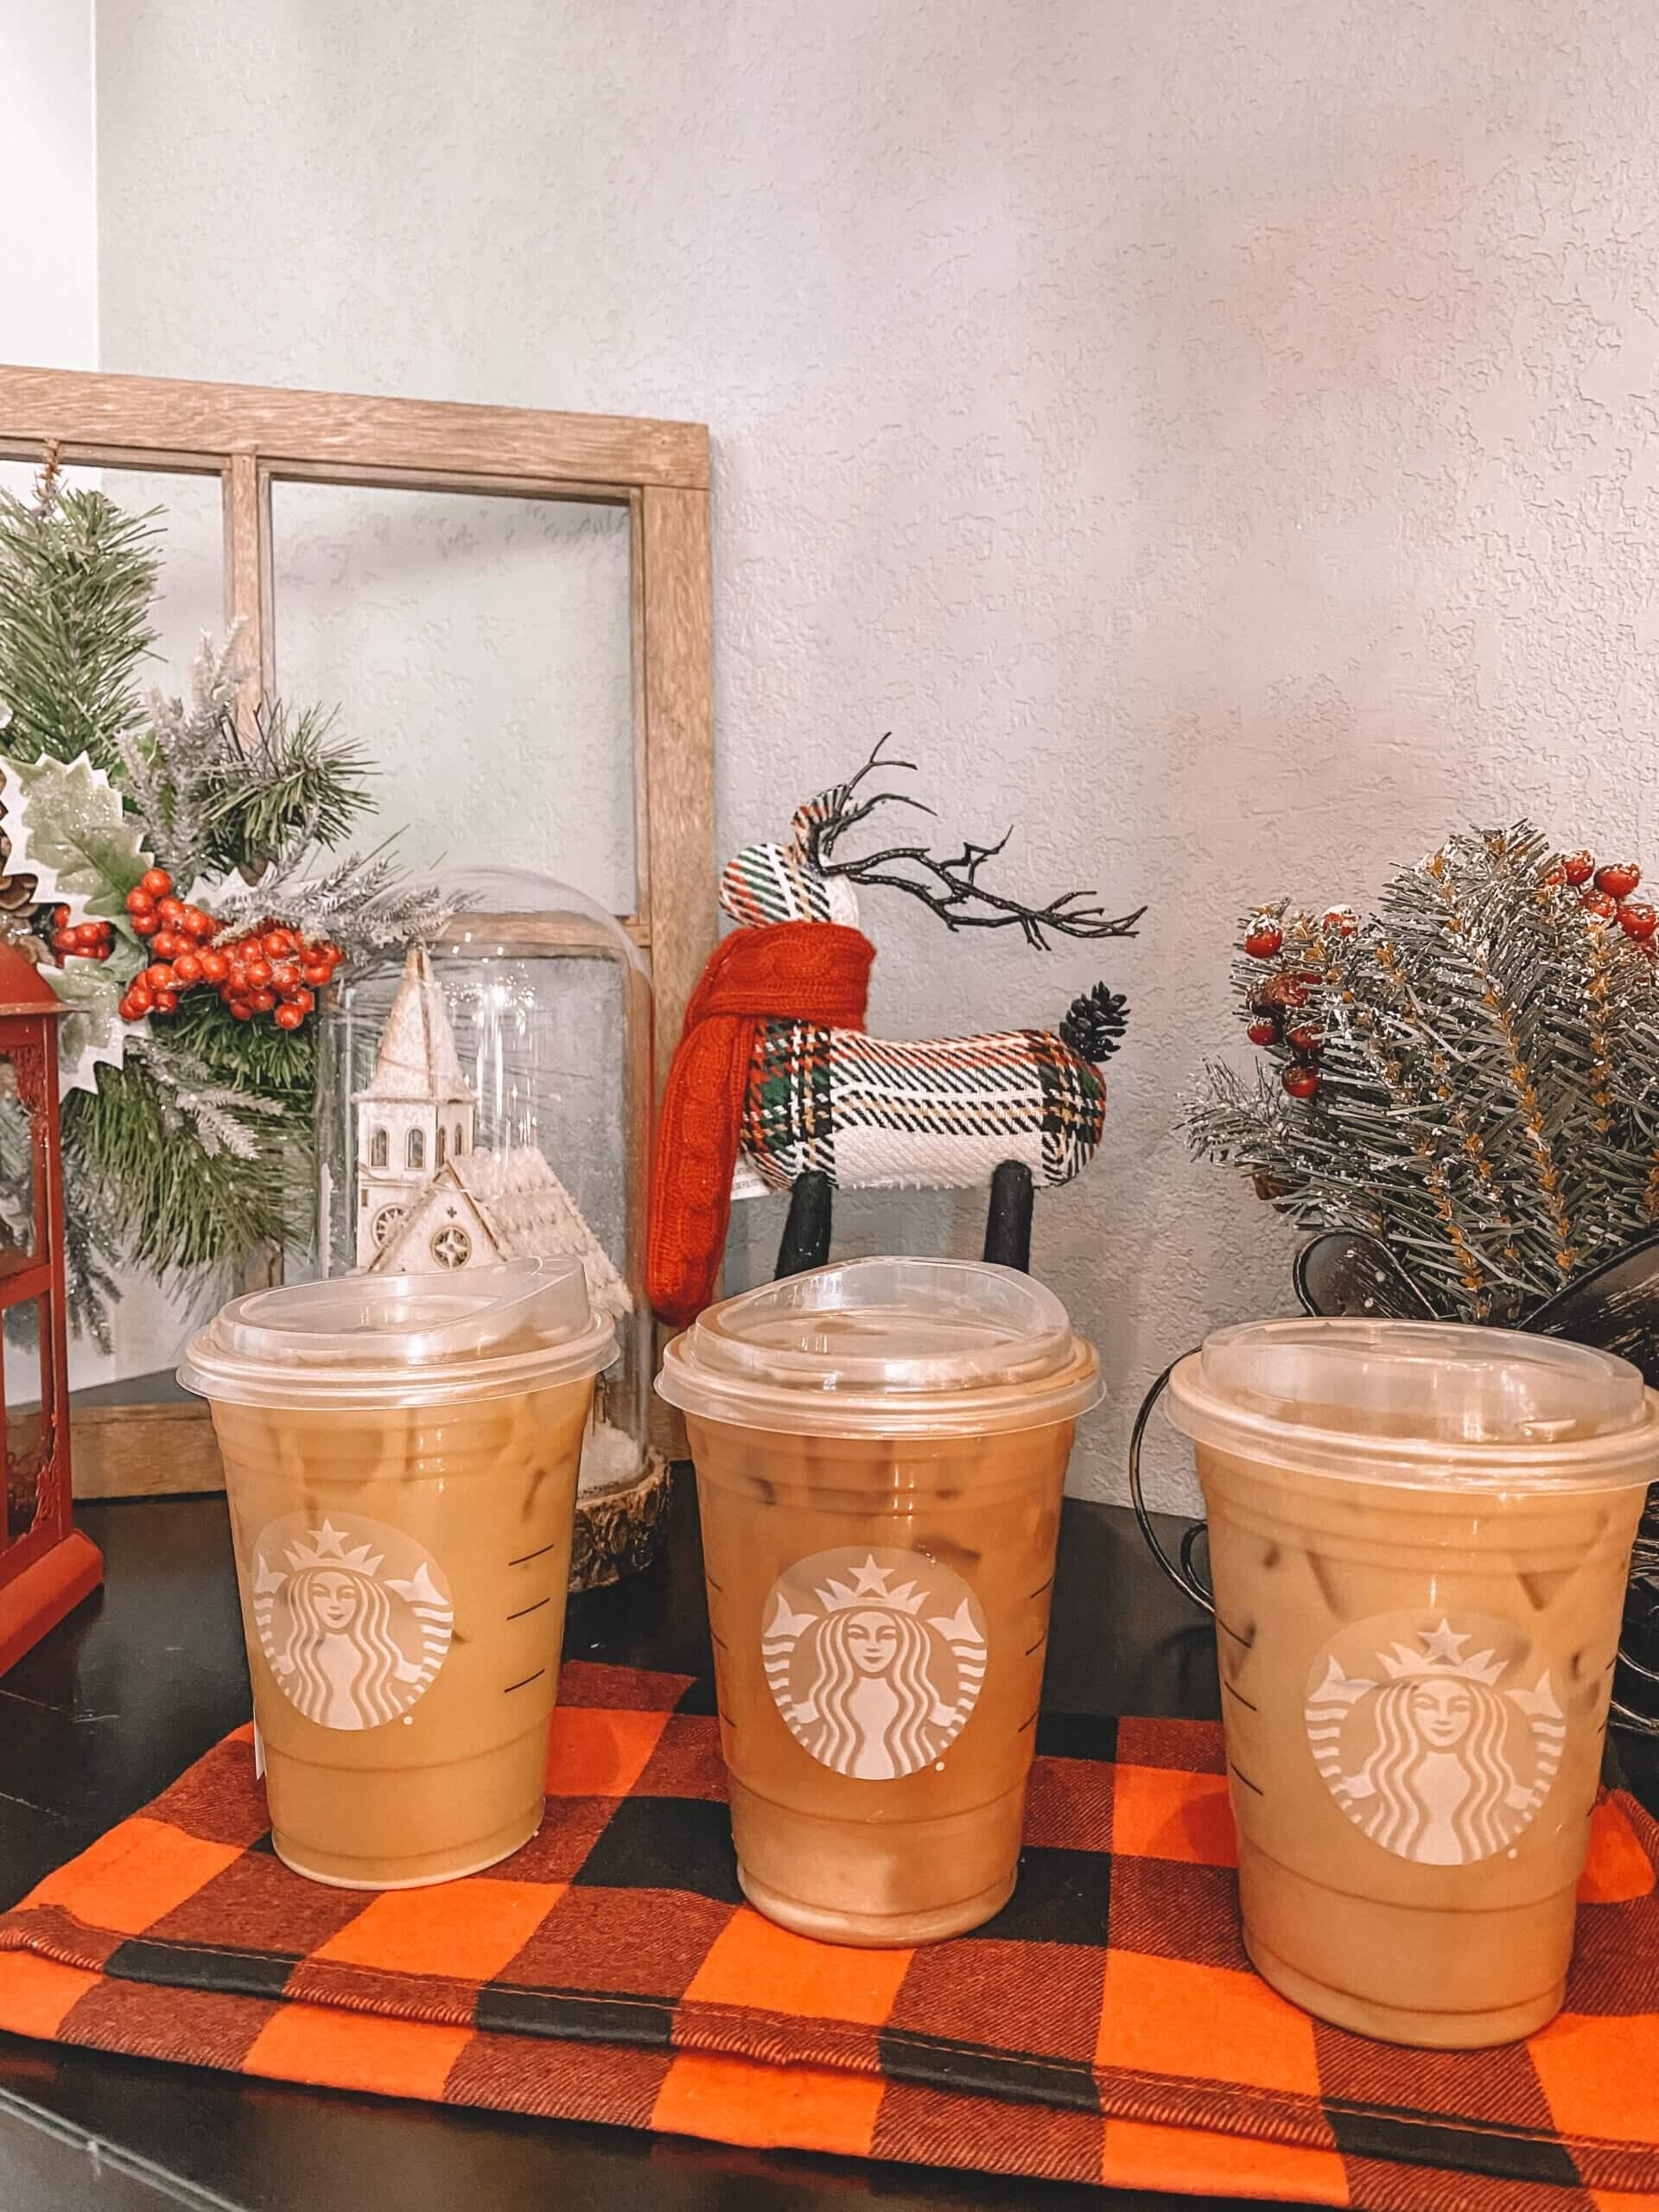 Starbucks Winter Drinks – Under 100 Calories